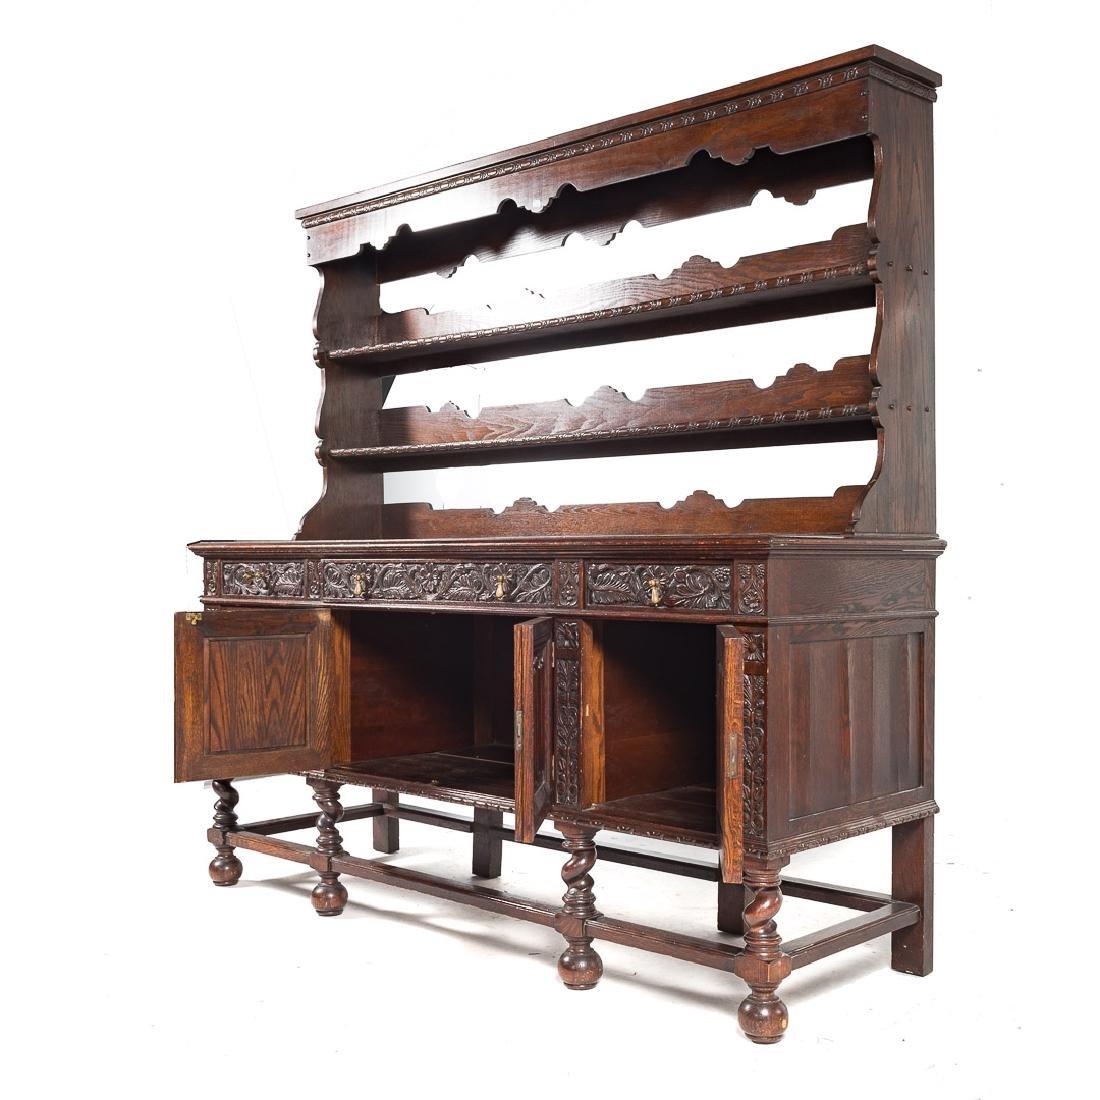 Jacobean Revival style carved oak dresser, - 4